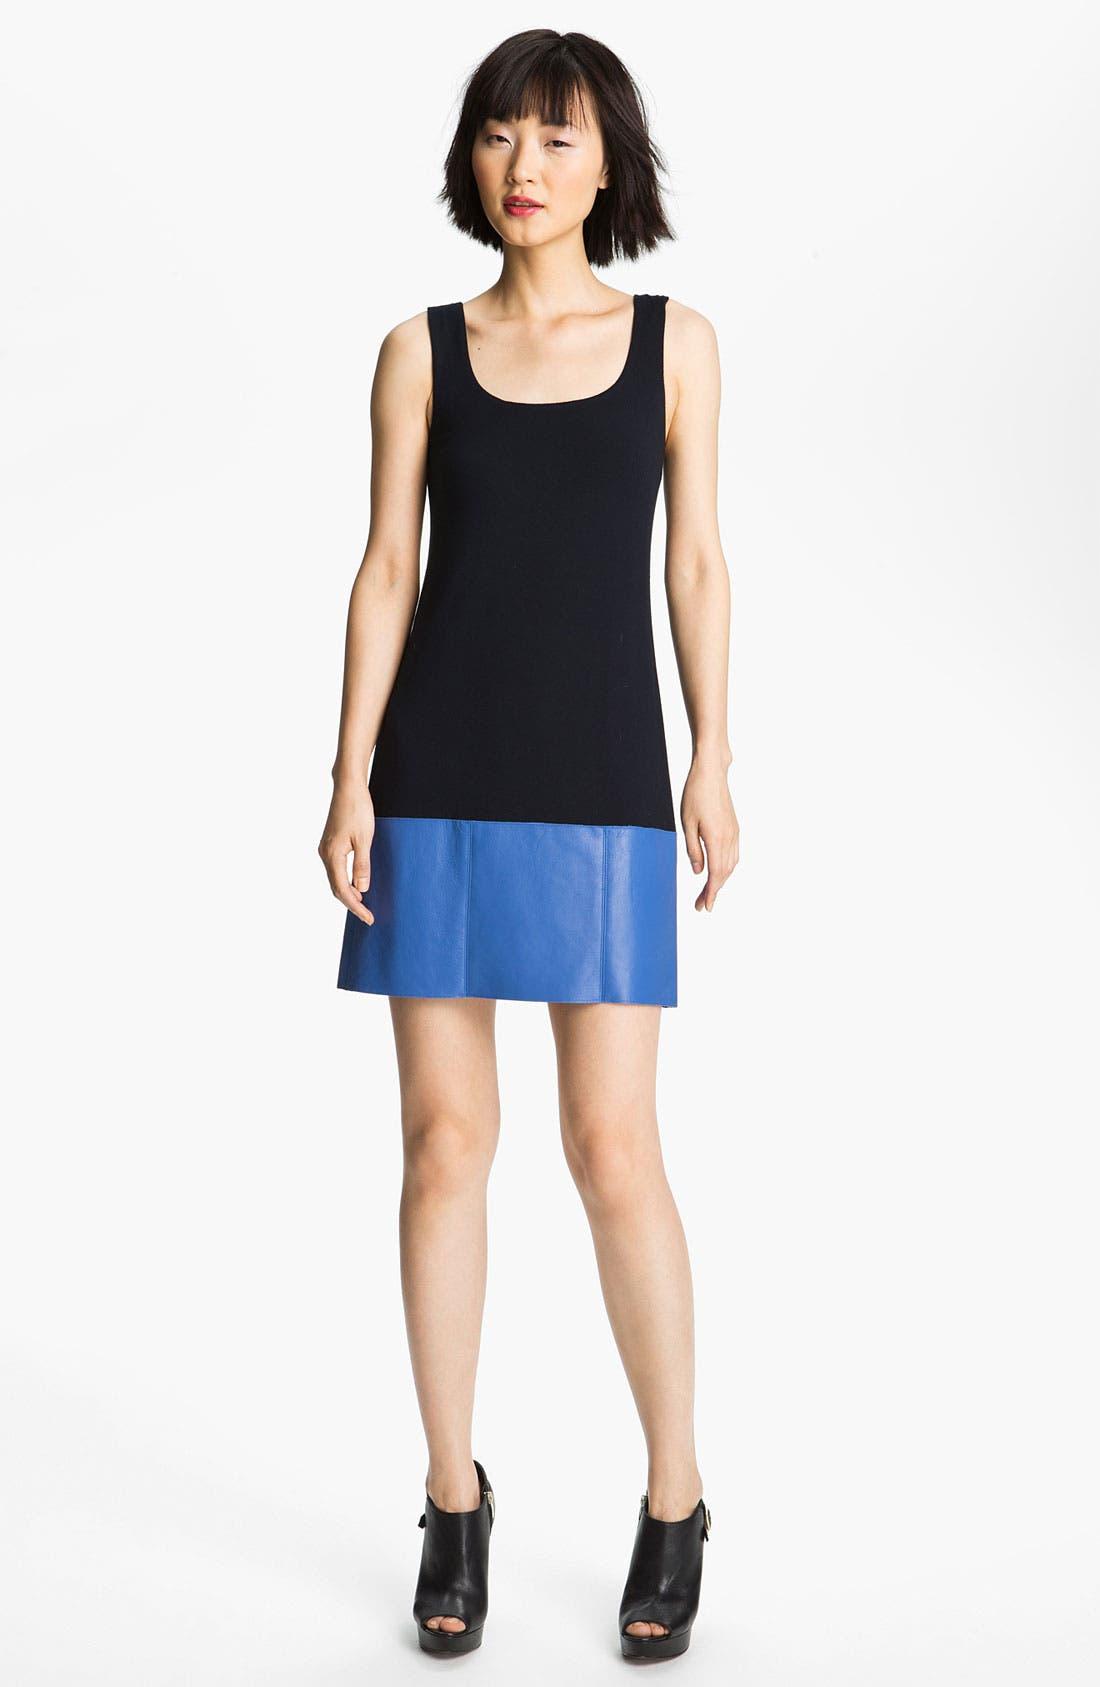 Alternate Image 1 Selected - B44 Dressed by Bailey 44 'Horizon' Colorblock Tank Dress